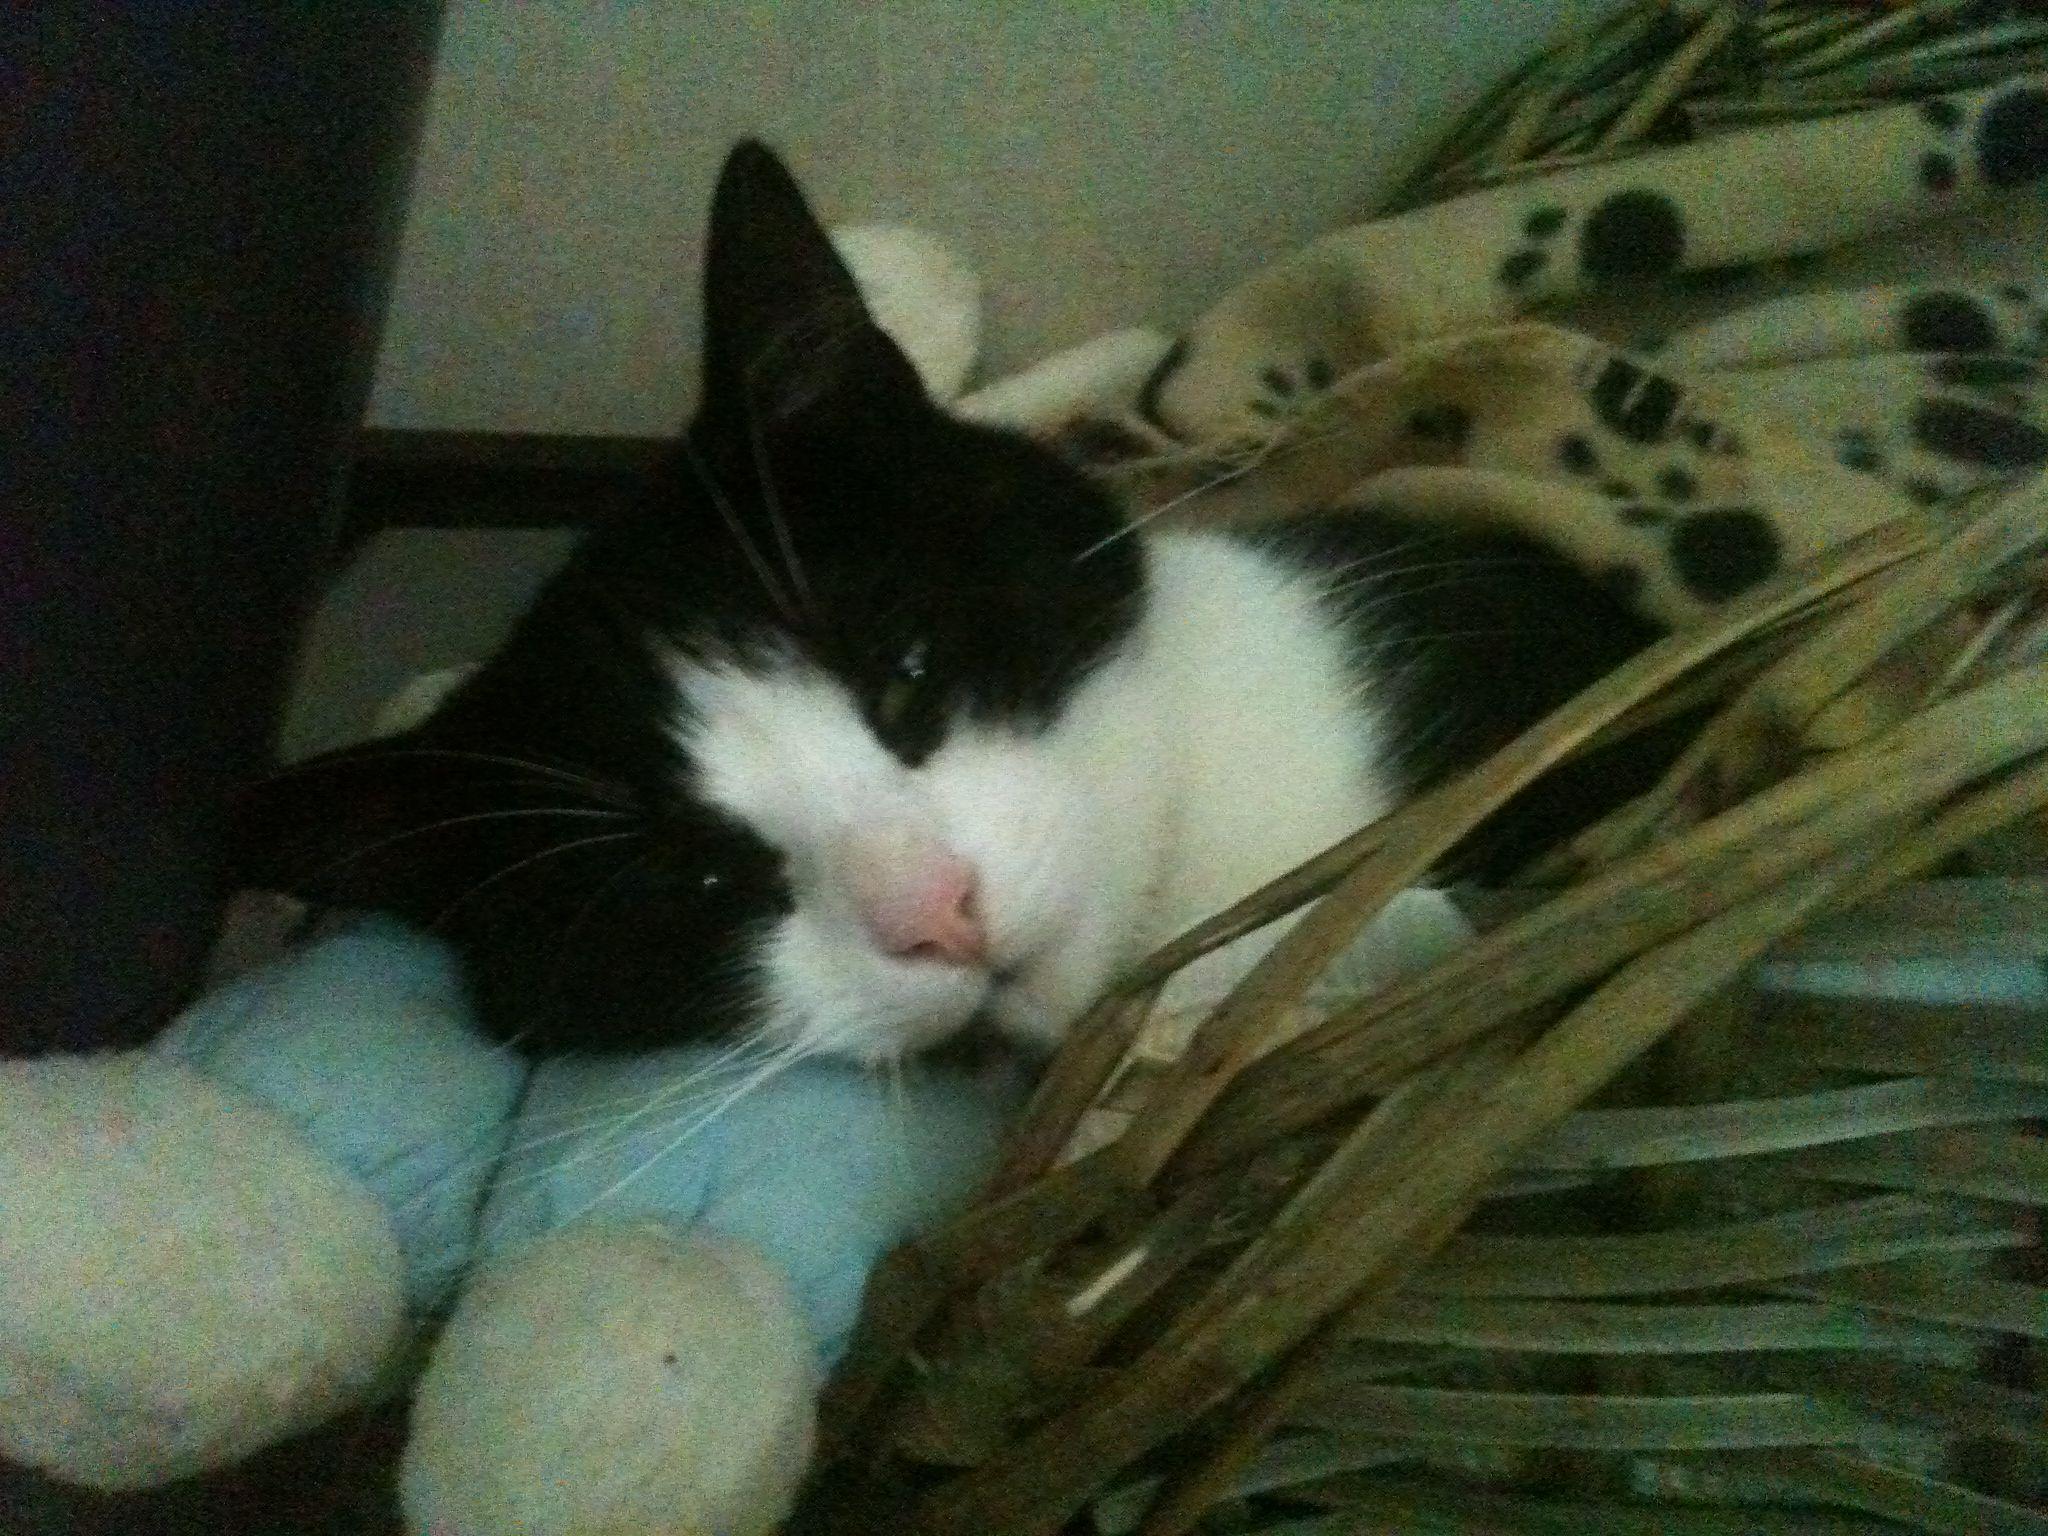 Loves her blanket and rabbit..